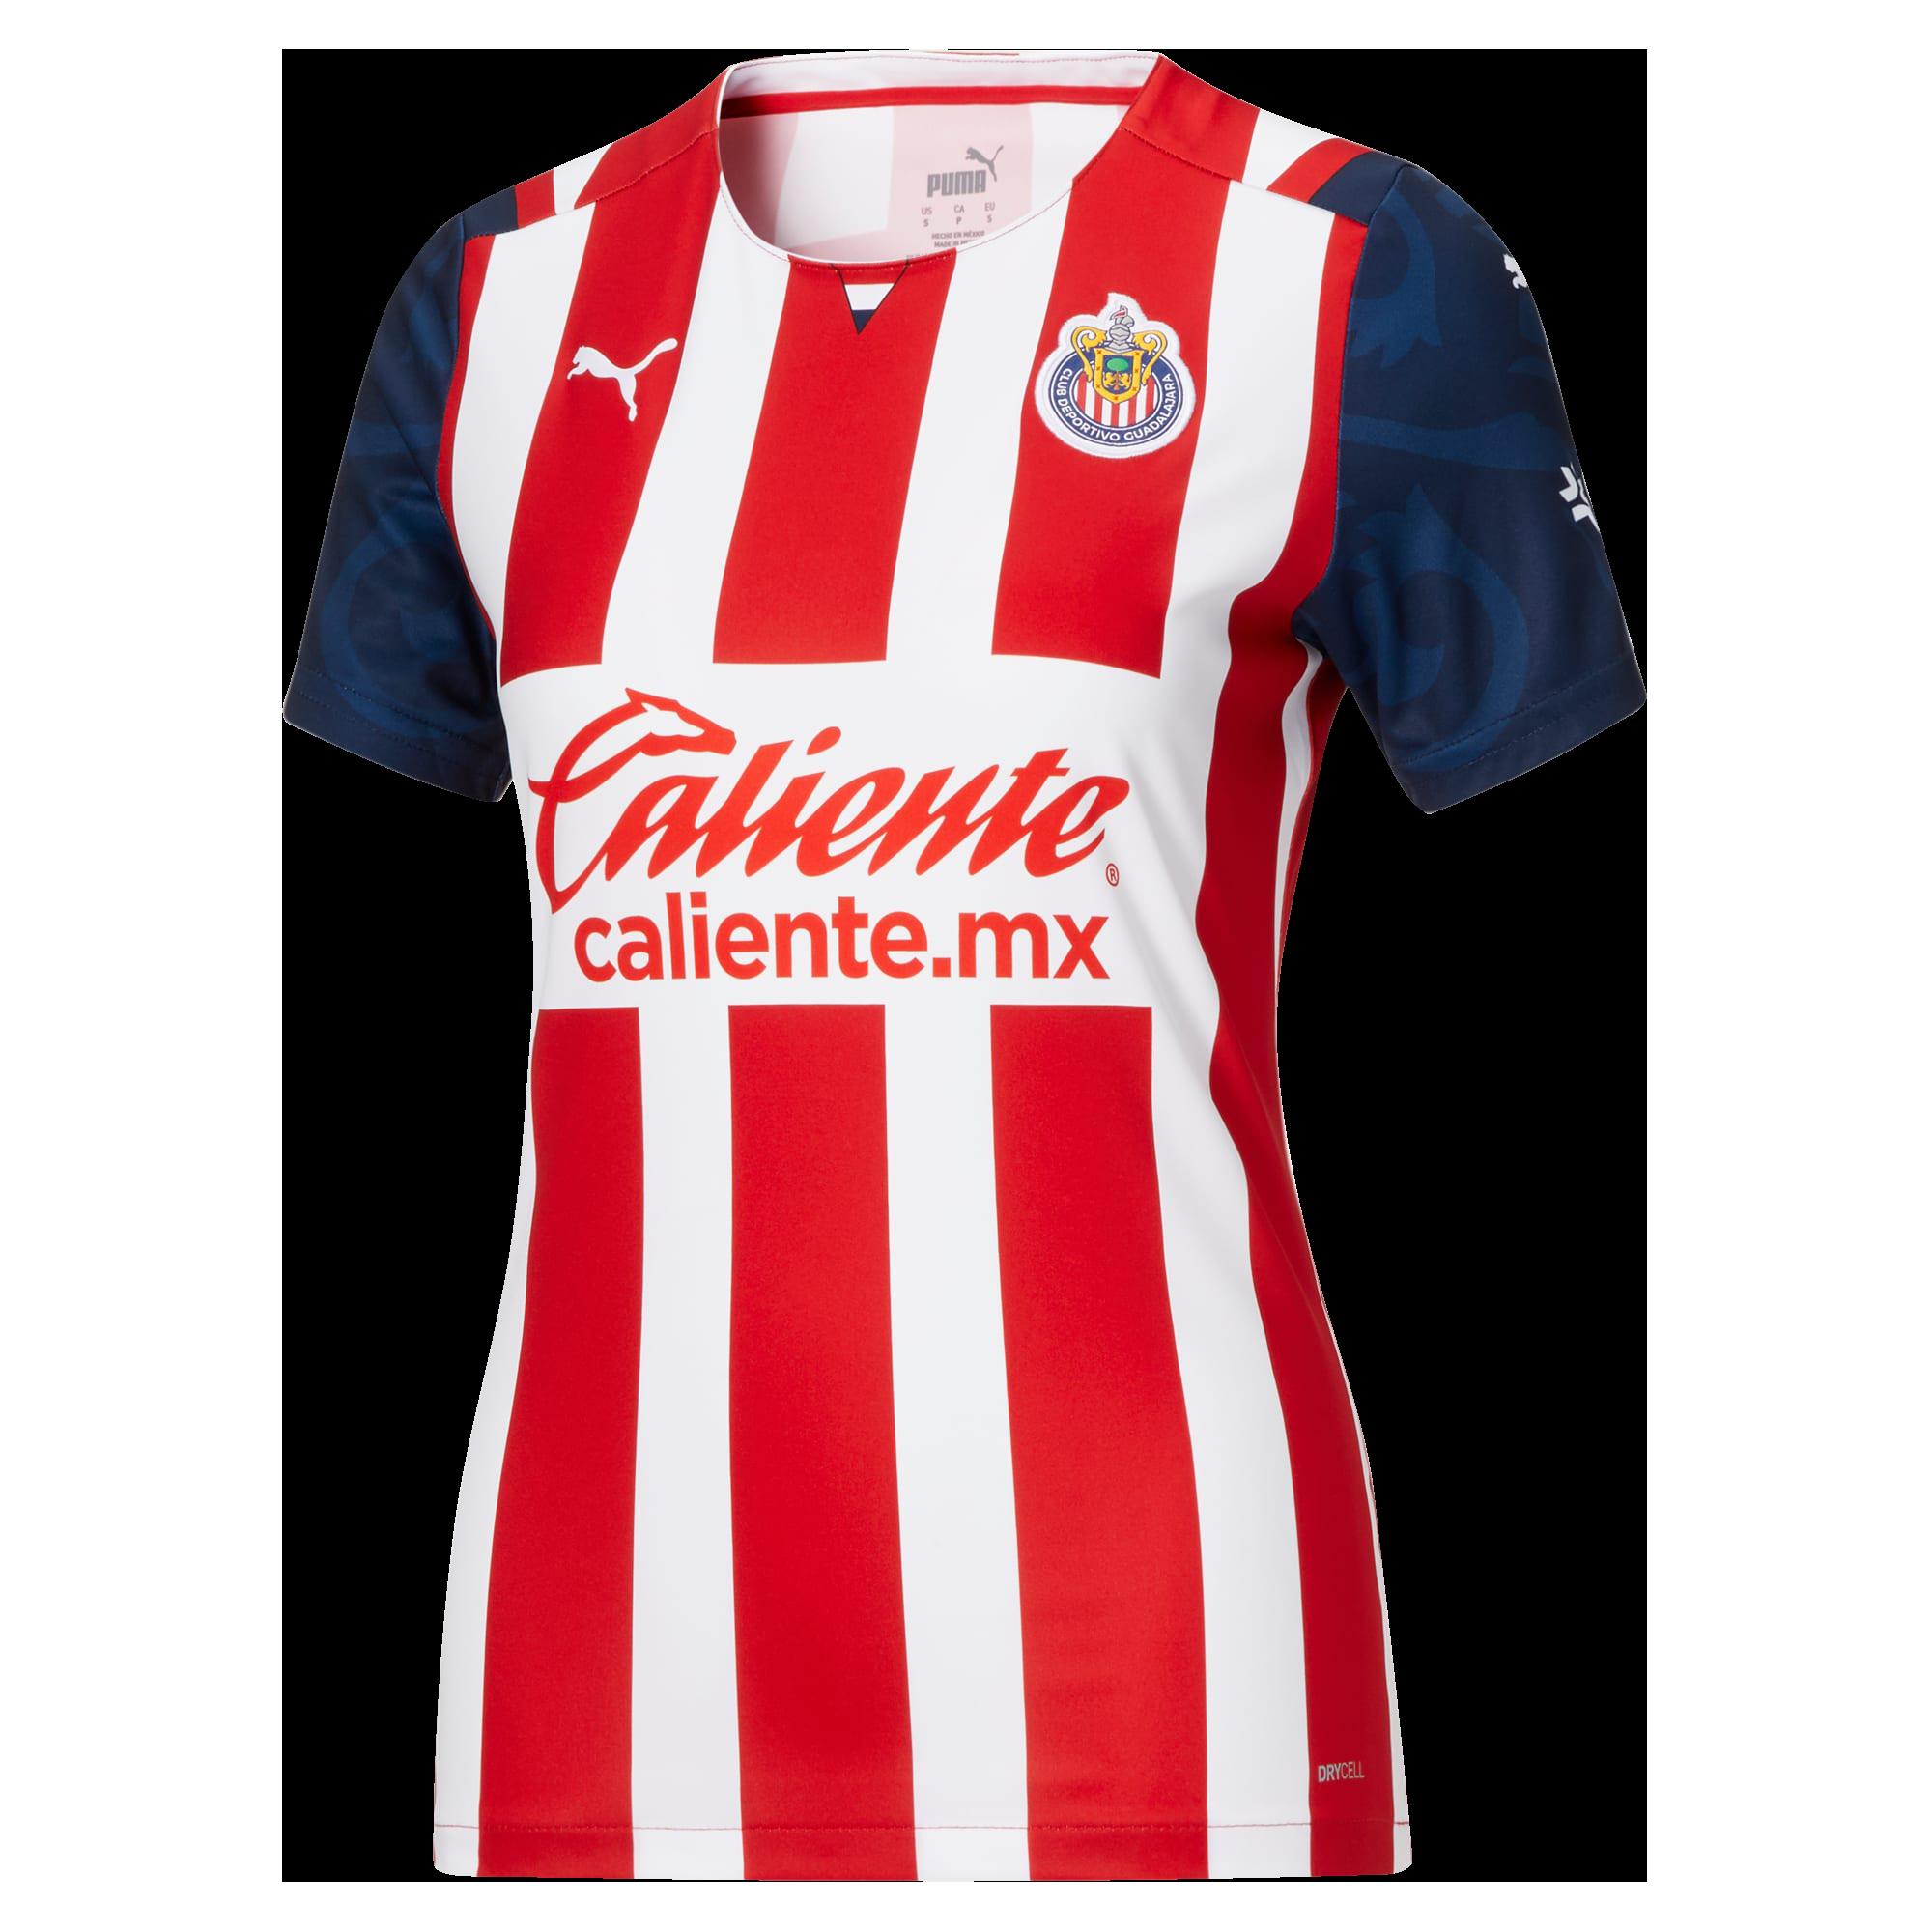 Chivas Home Jersey 2021/22 Women